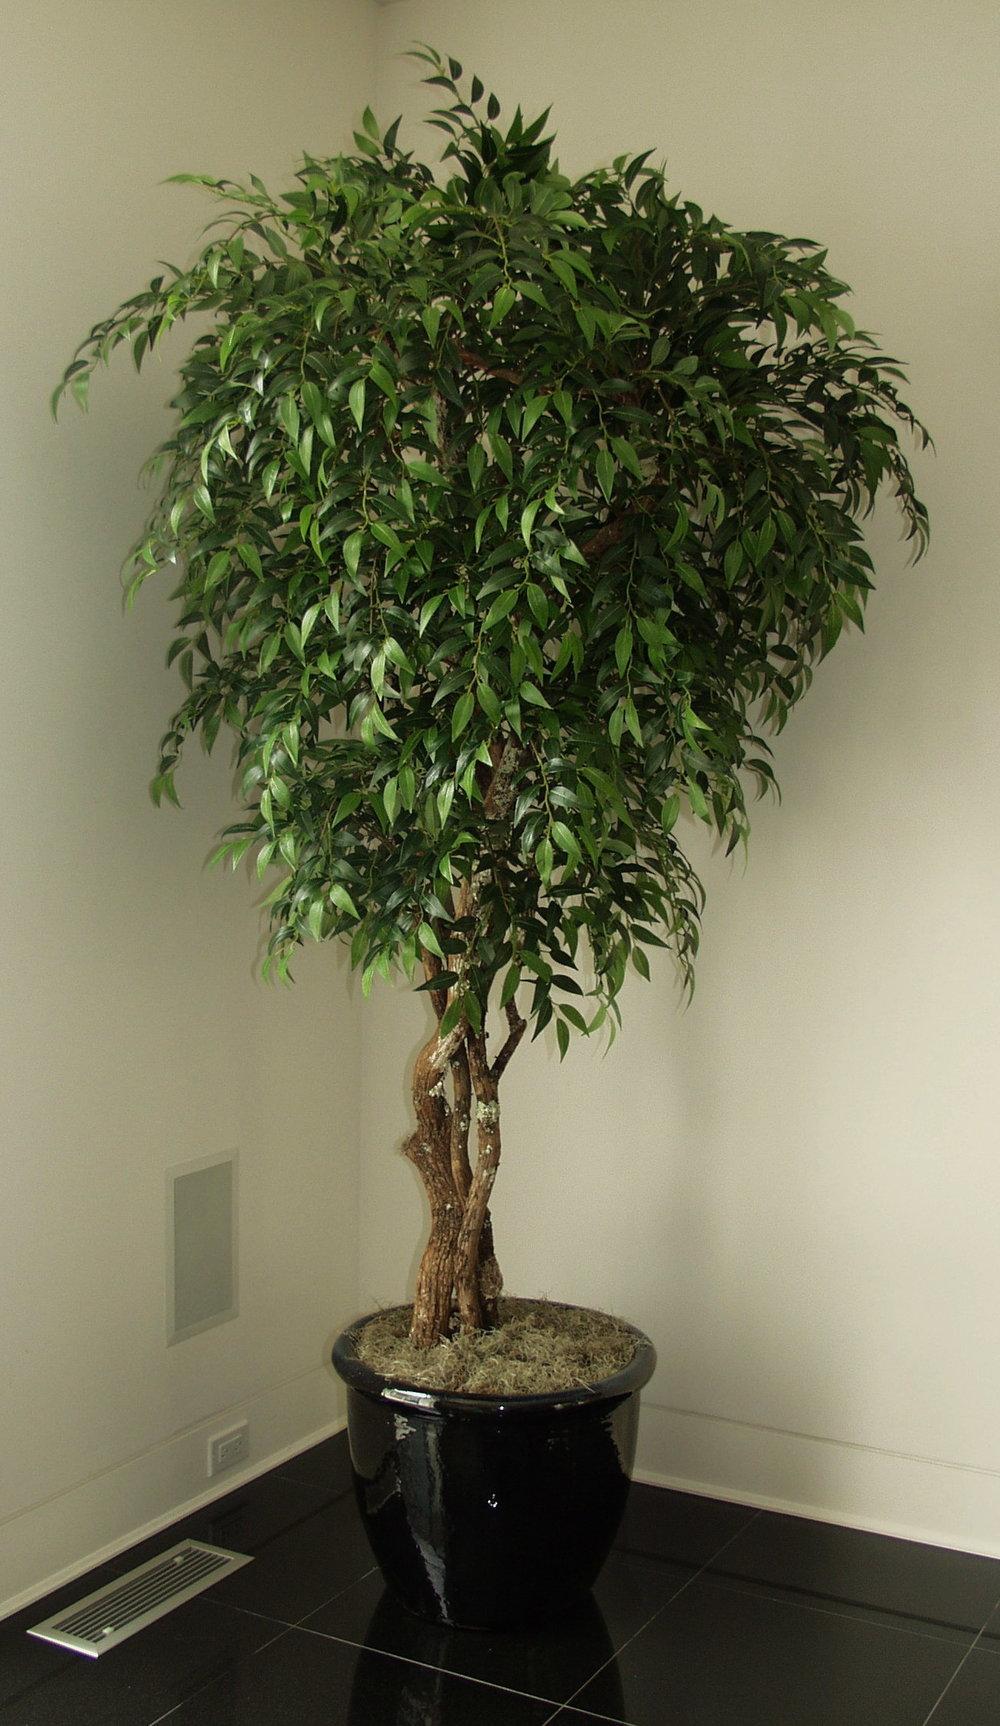 TCM 1270- Smilax Tree